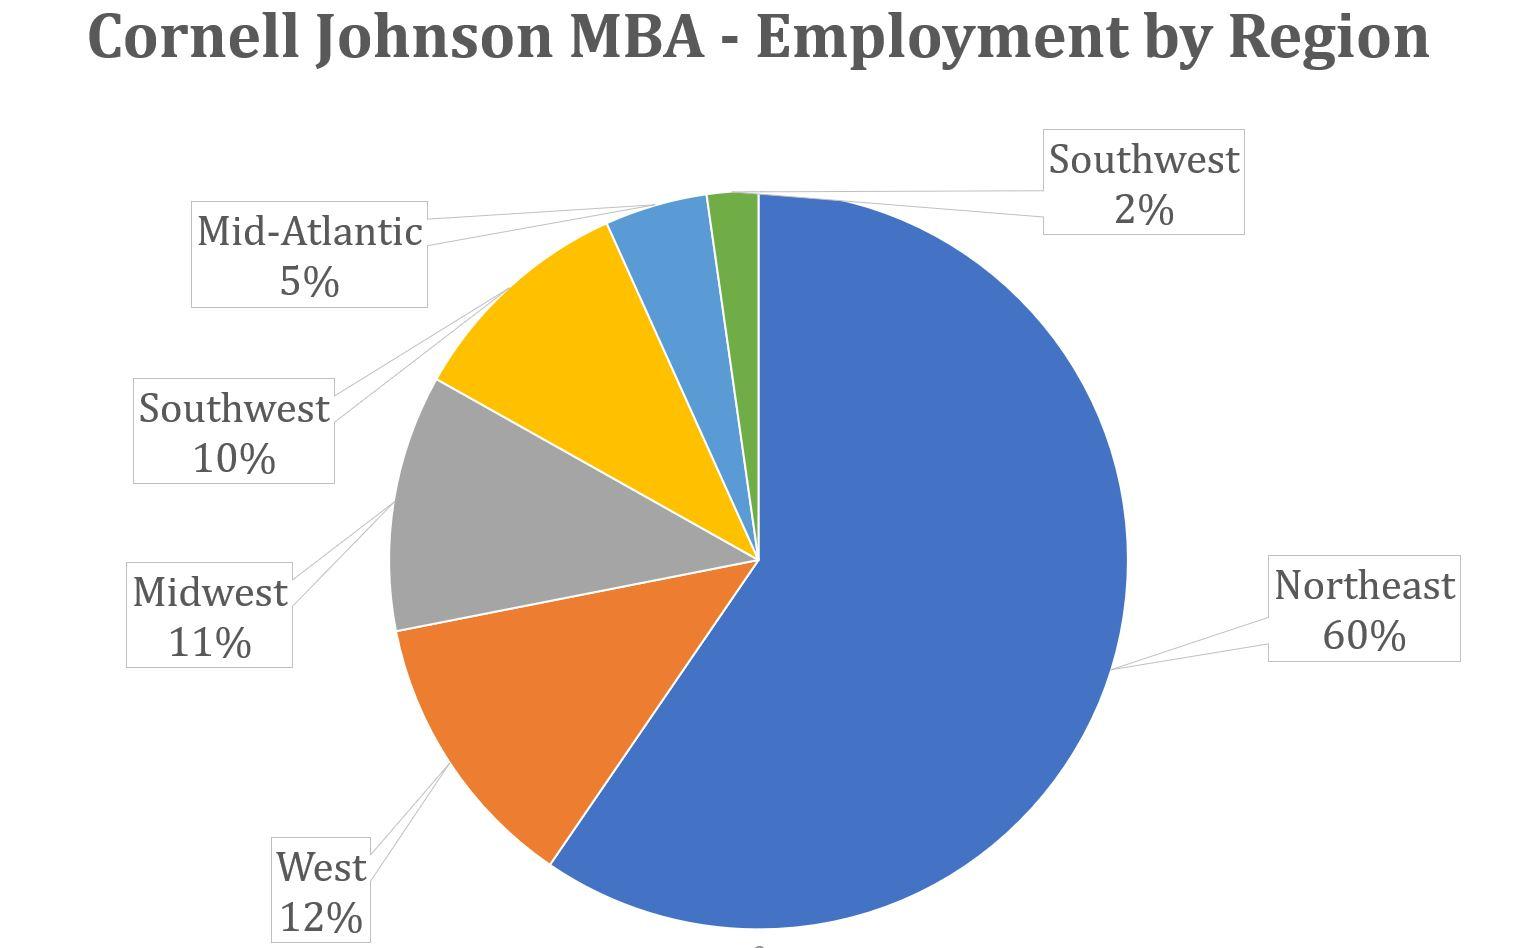 Cornell Johnson MBA - Employment by Region